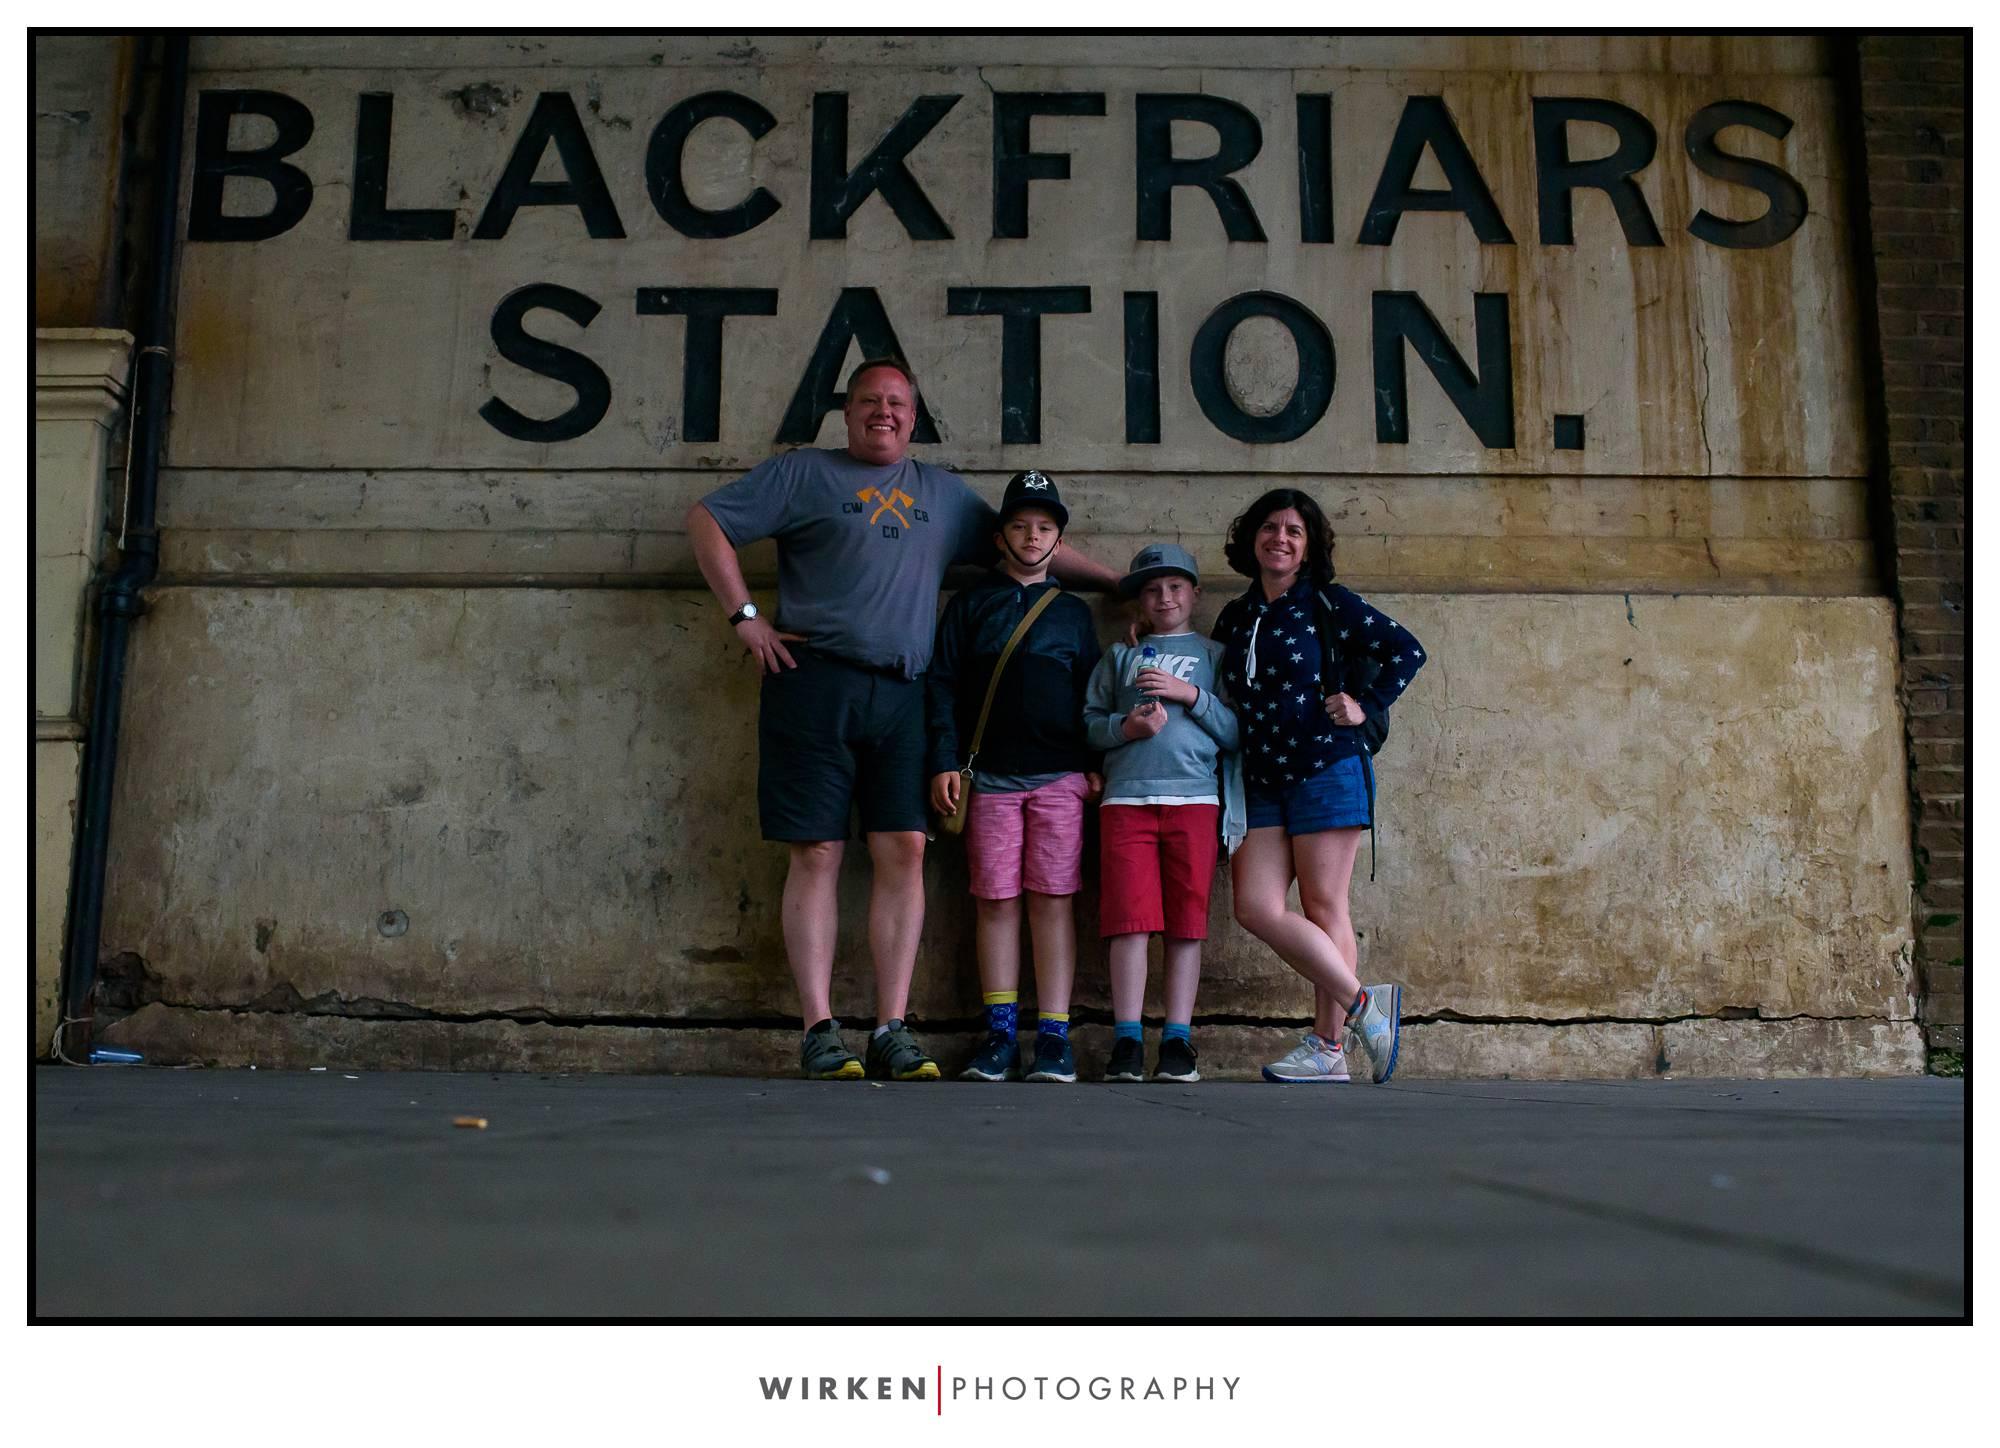 Blackfriars station family travel photography